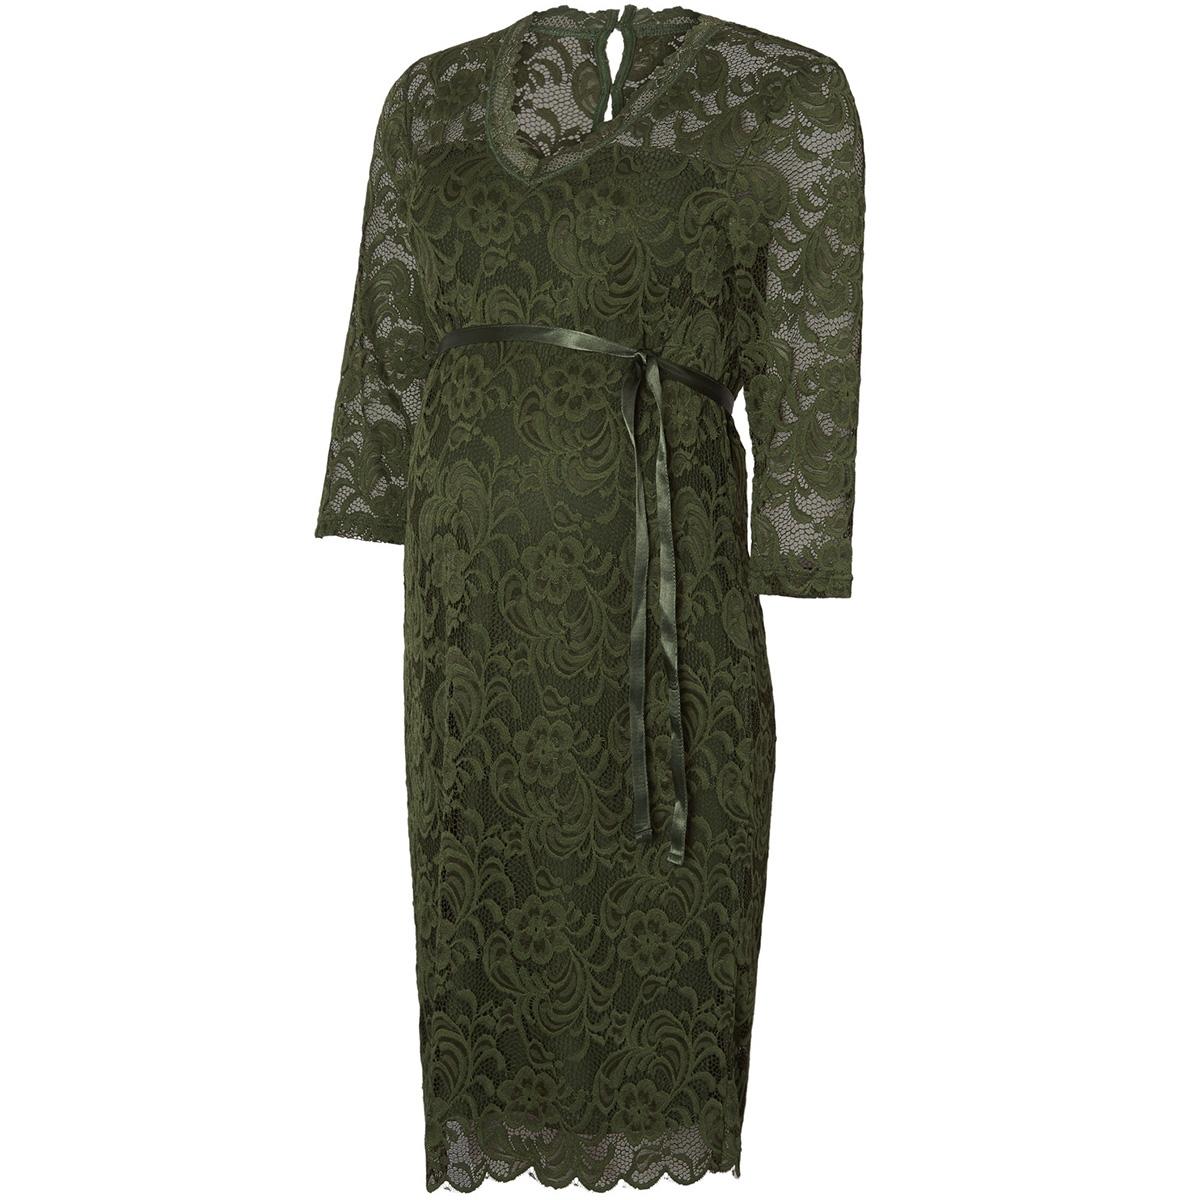 mlmivana 3/4 jersey dress 20007260 mama-licious positie jurk thyme